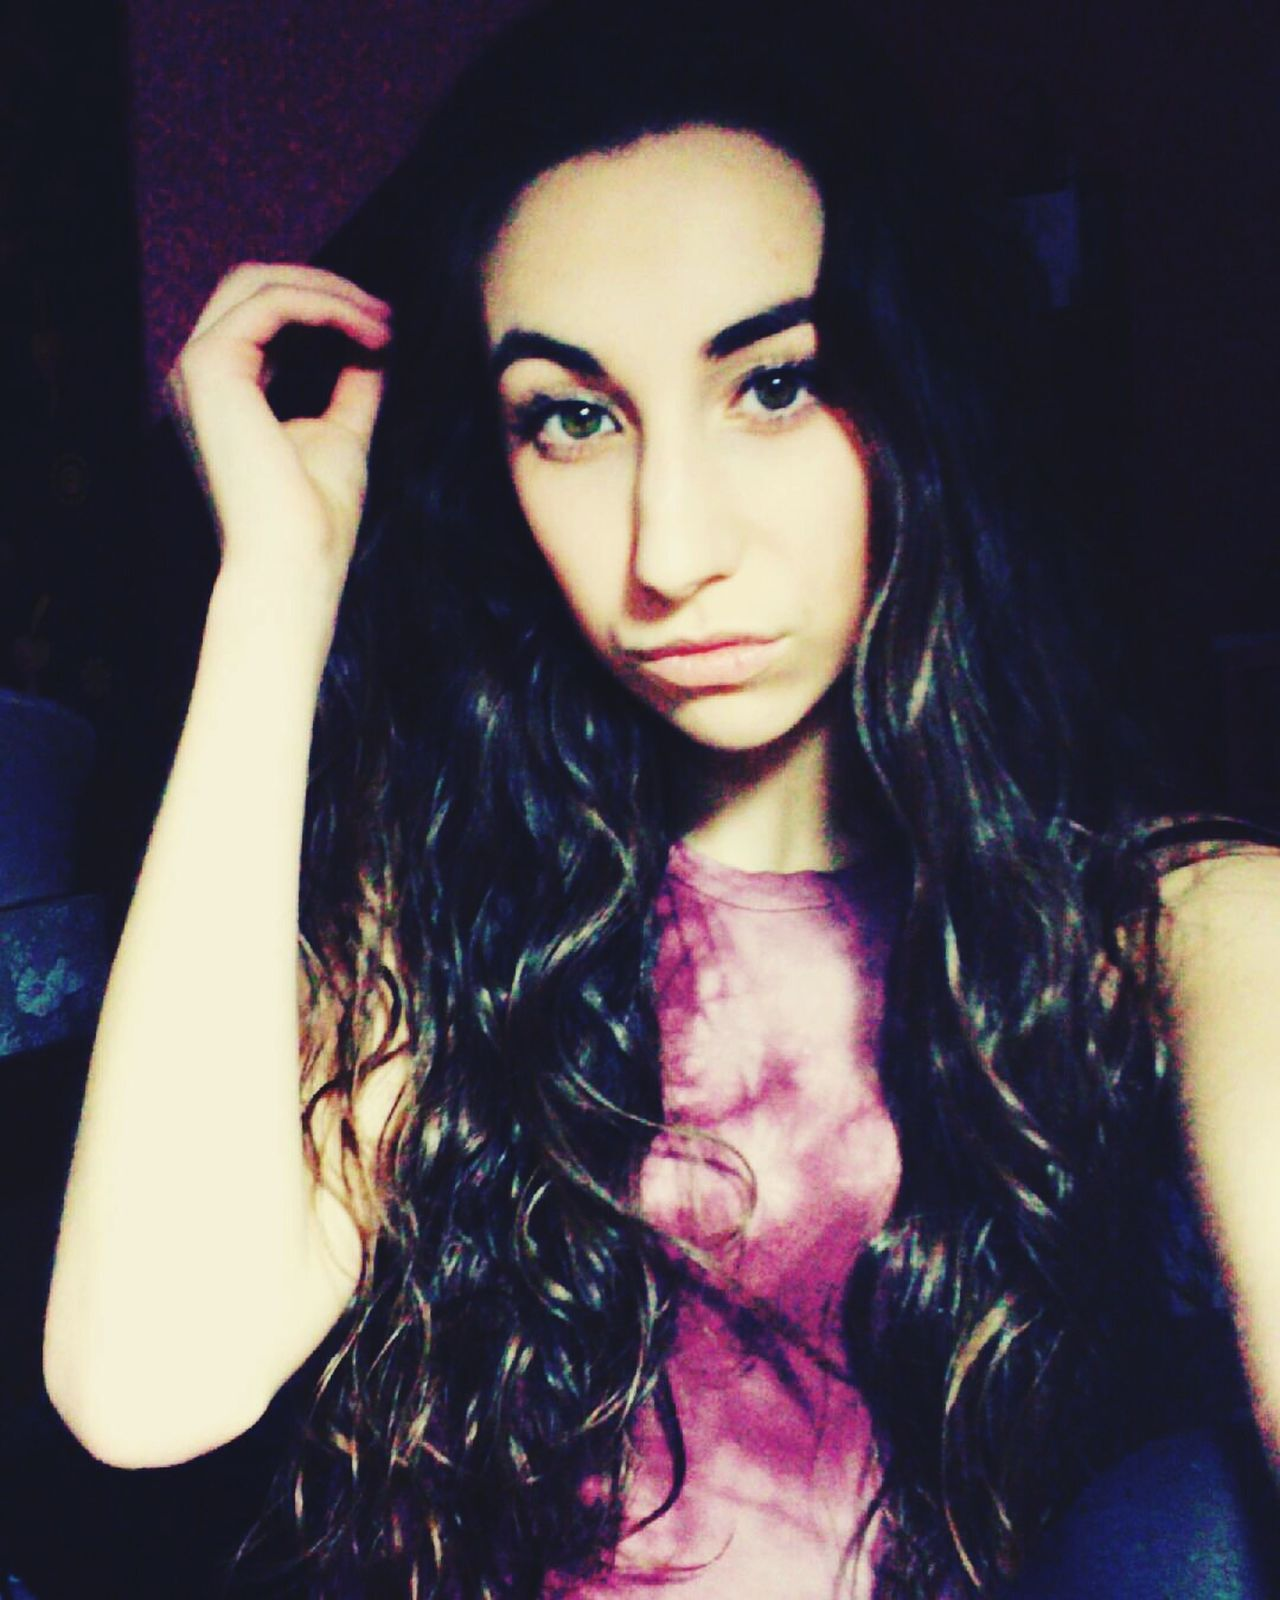 Selfie✌ Selfienation Long Hair Snapchatfilters Snapchat Diffeyecolors